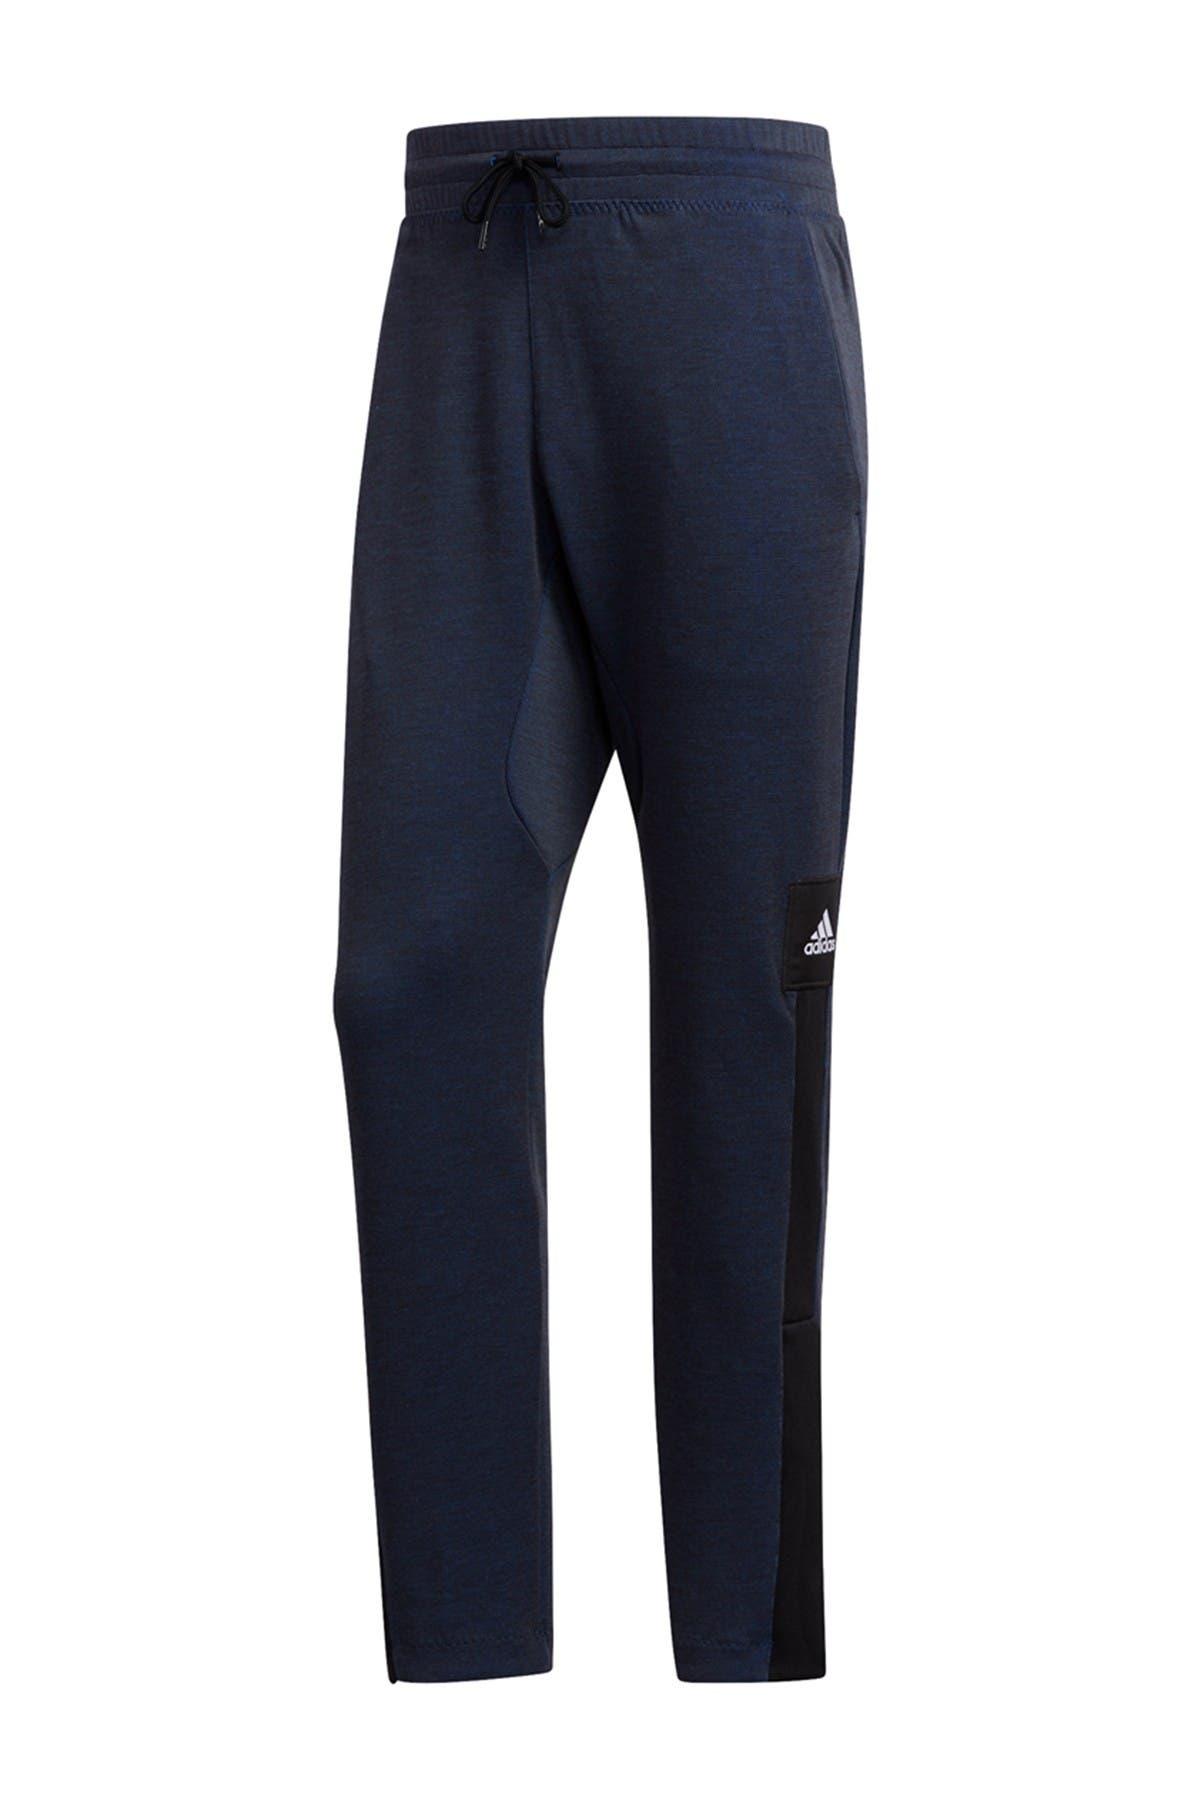 Image of adidas Cross-Up 365 Pants